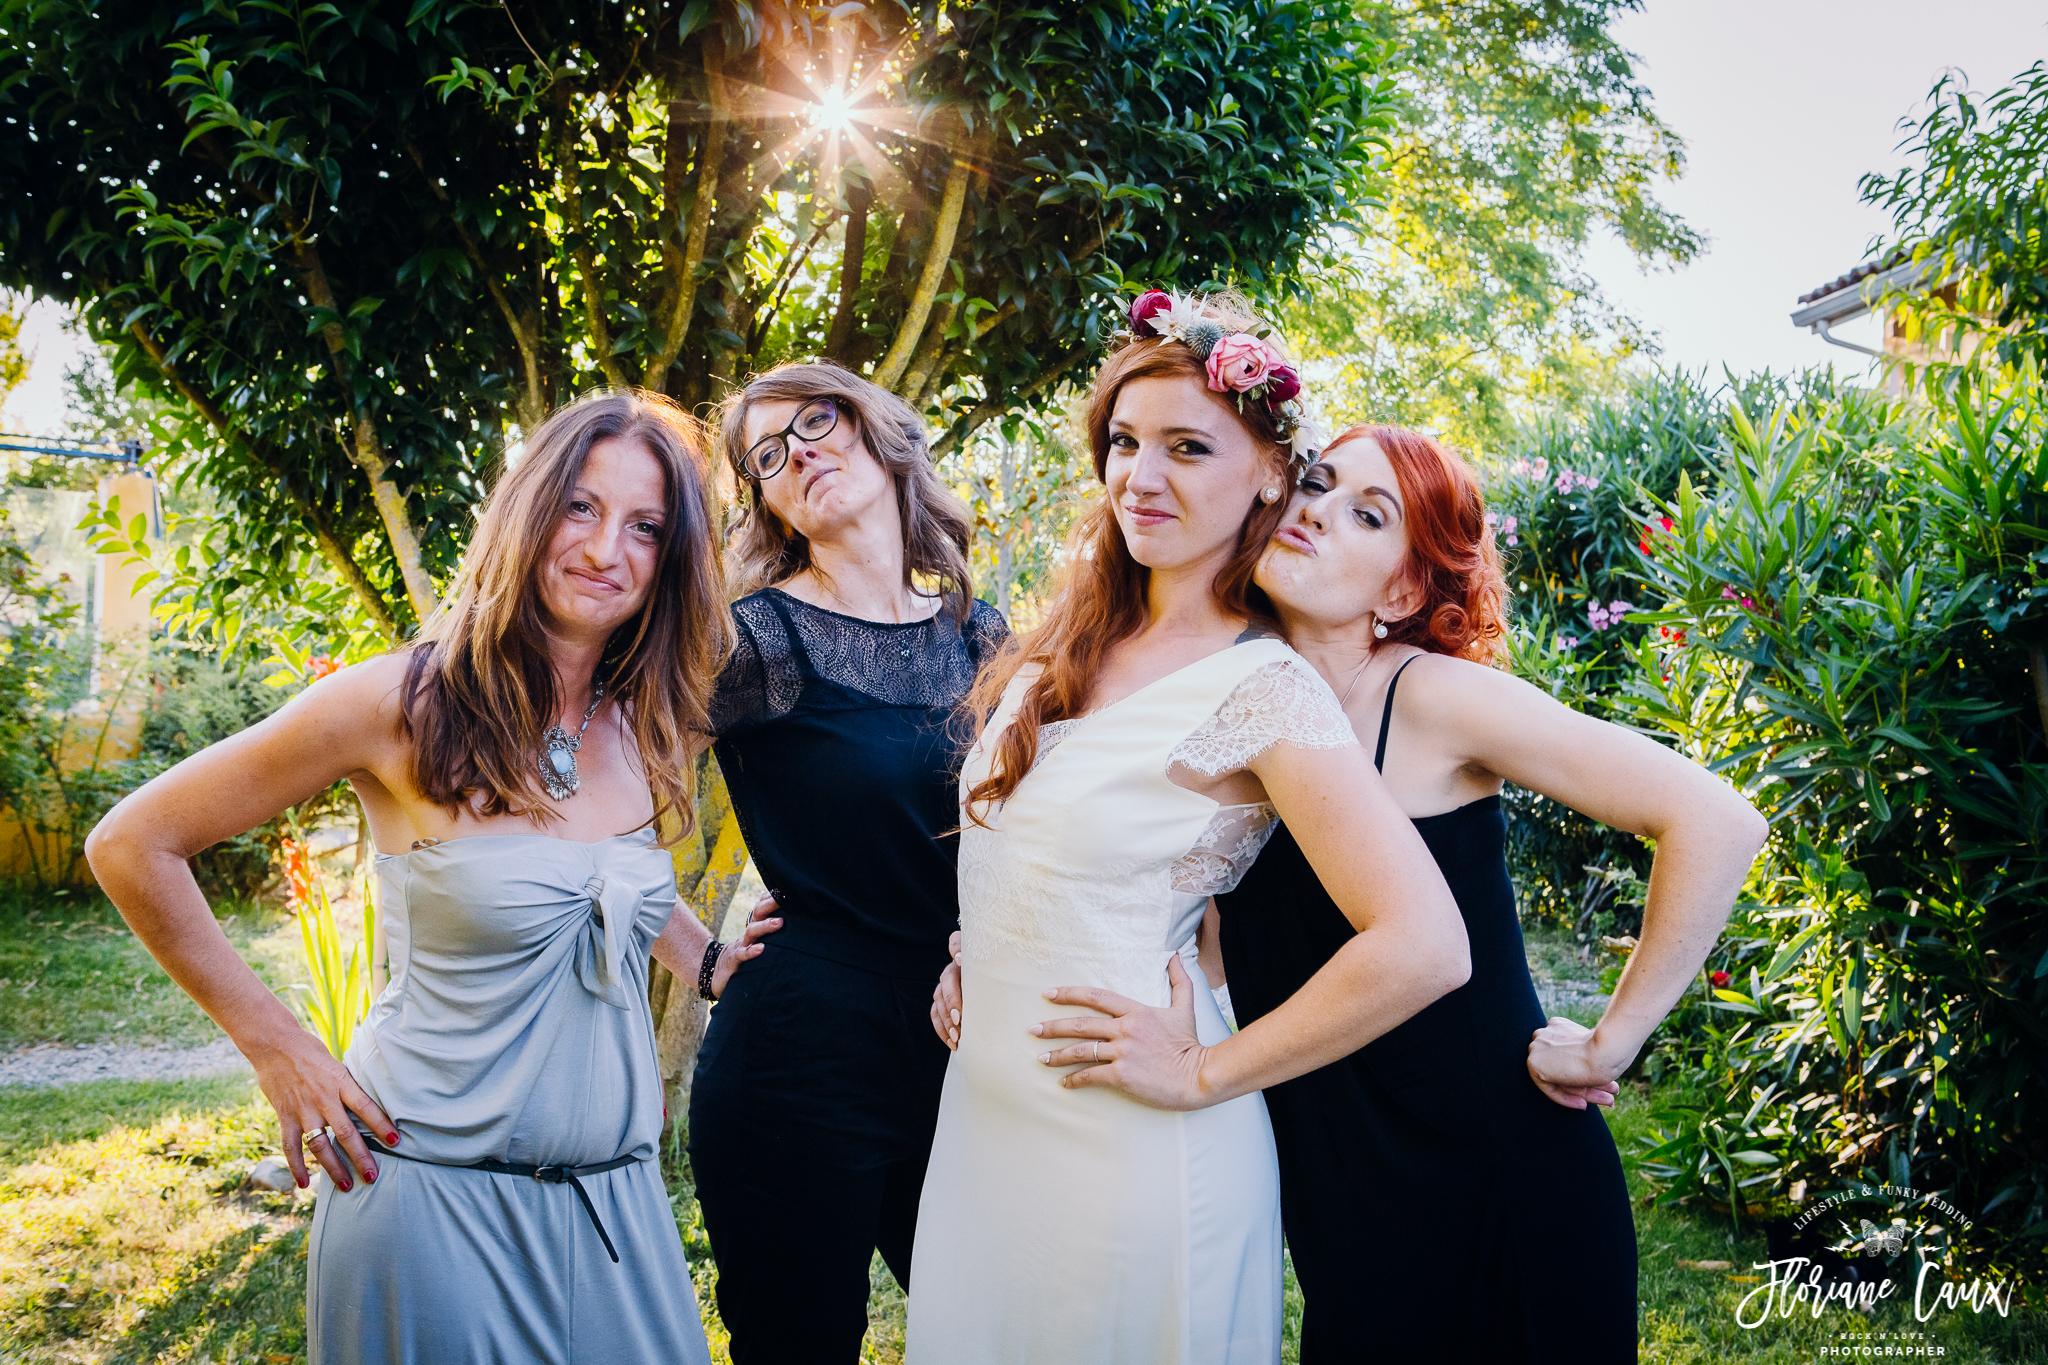 photographe-mariage-toulouse-rocknroll-maries-tatoues-floriane-caux-112